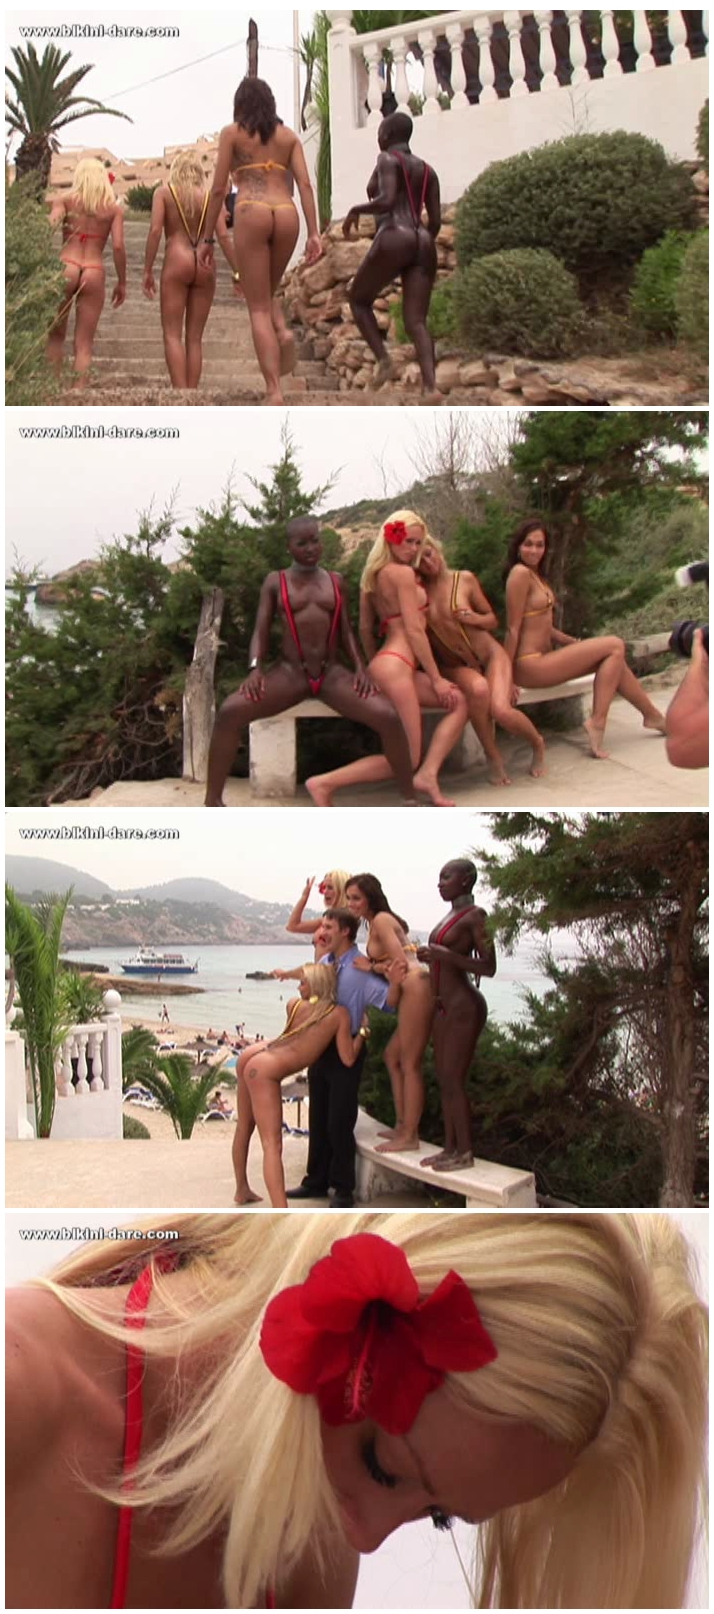 bikini-dare126_cover.jpg